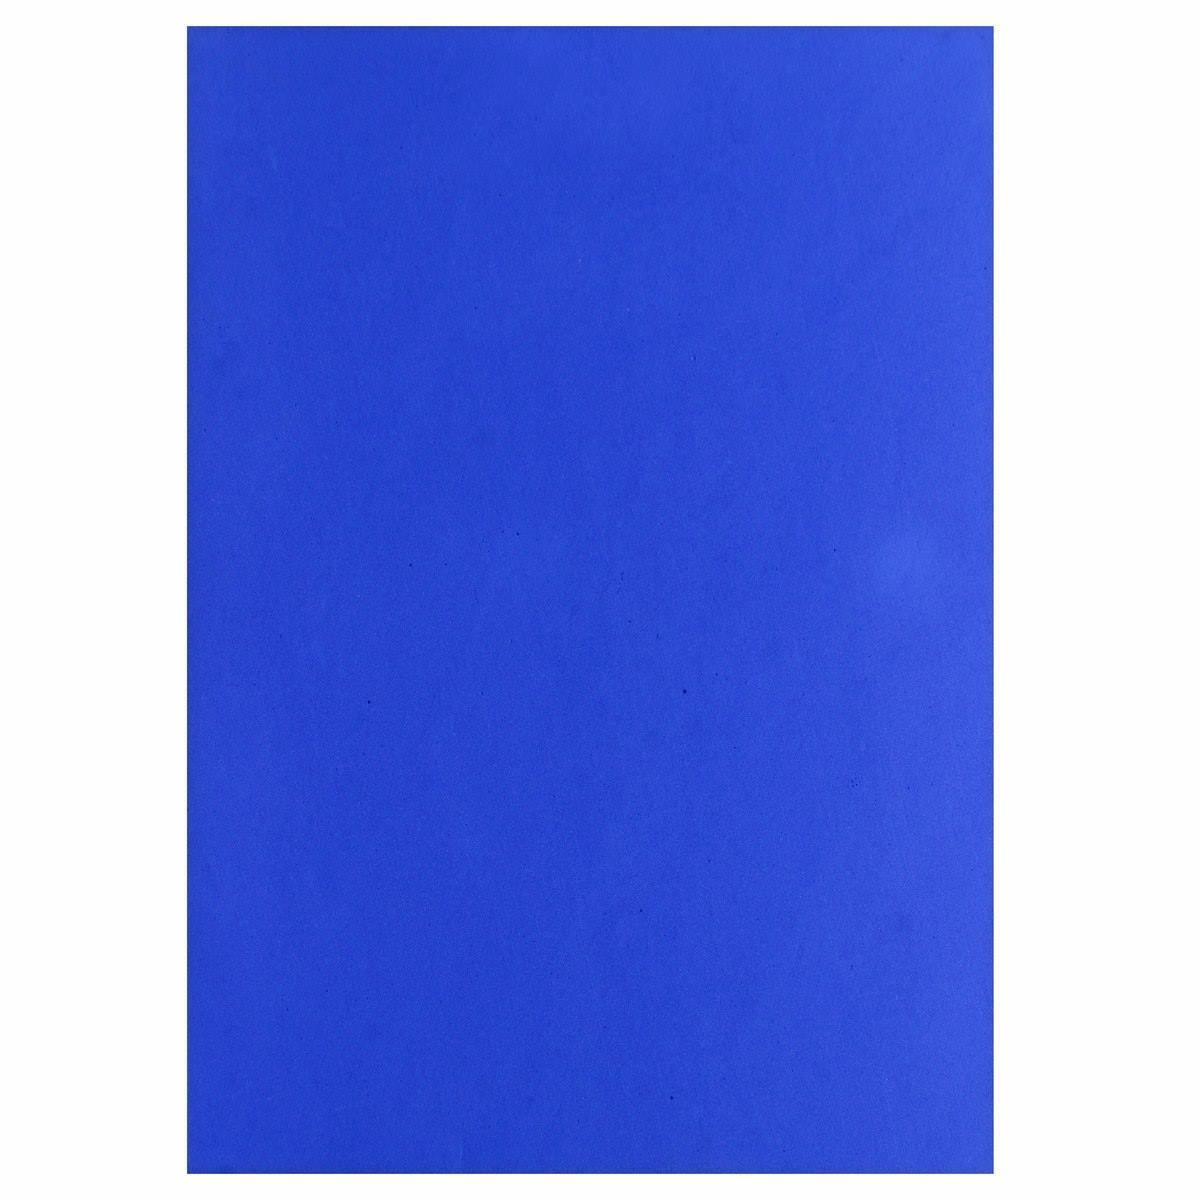 Foam Sheets A4 Size Without Sticker 3MM Blue